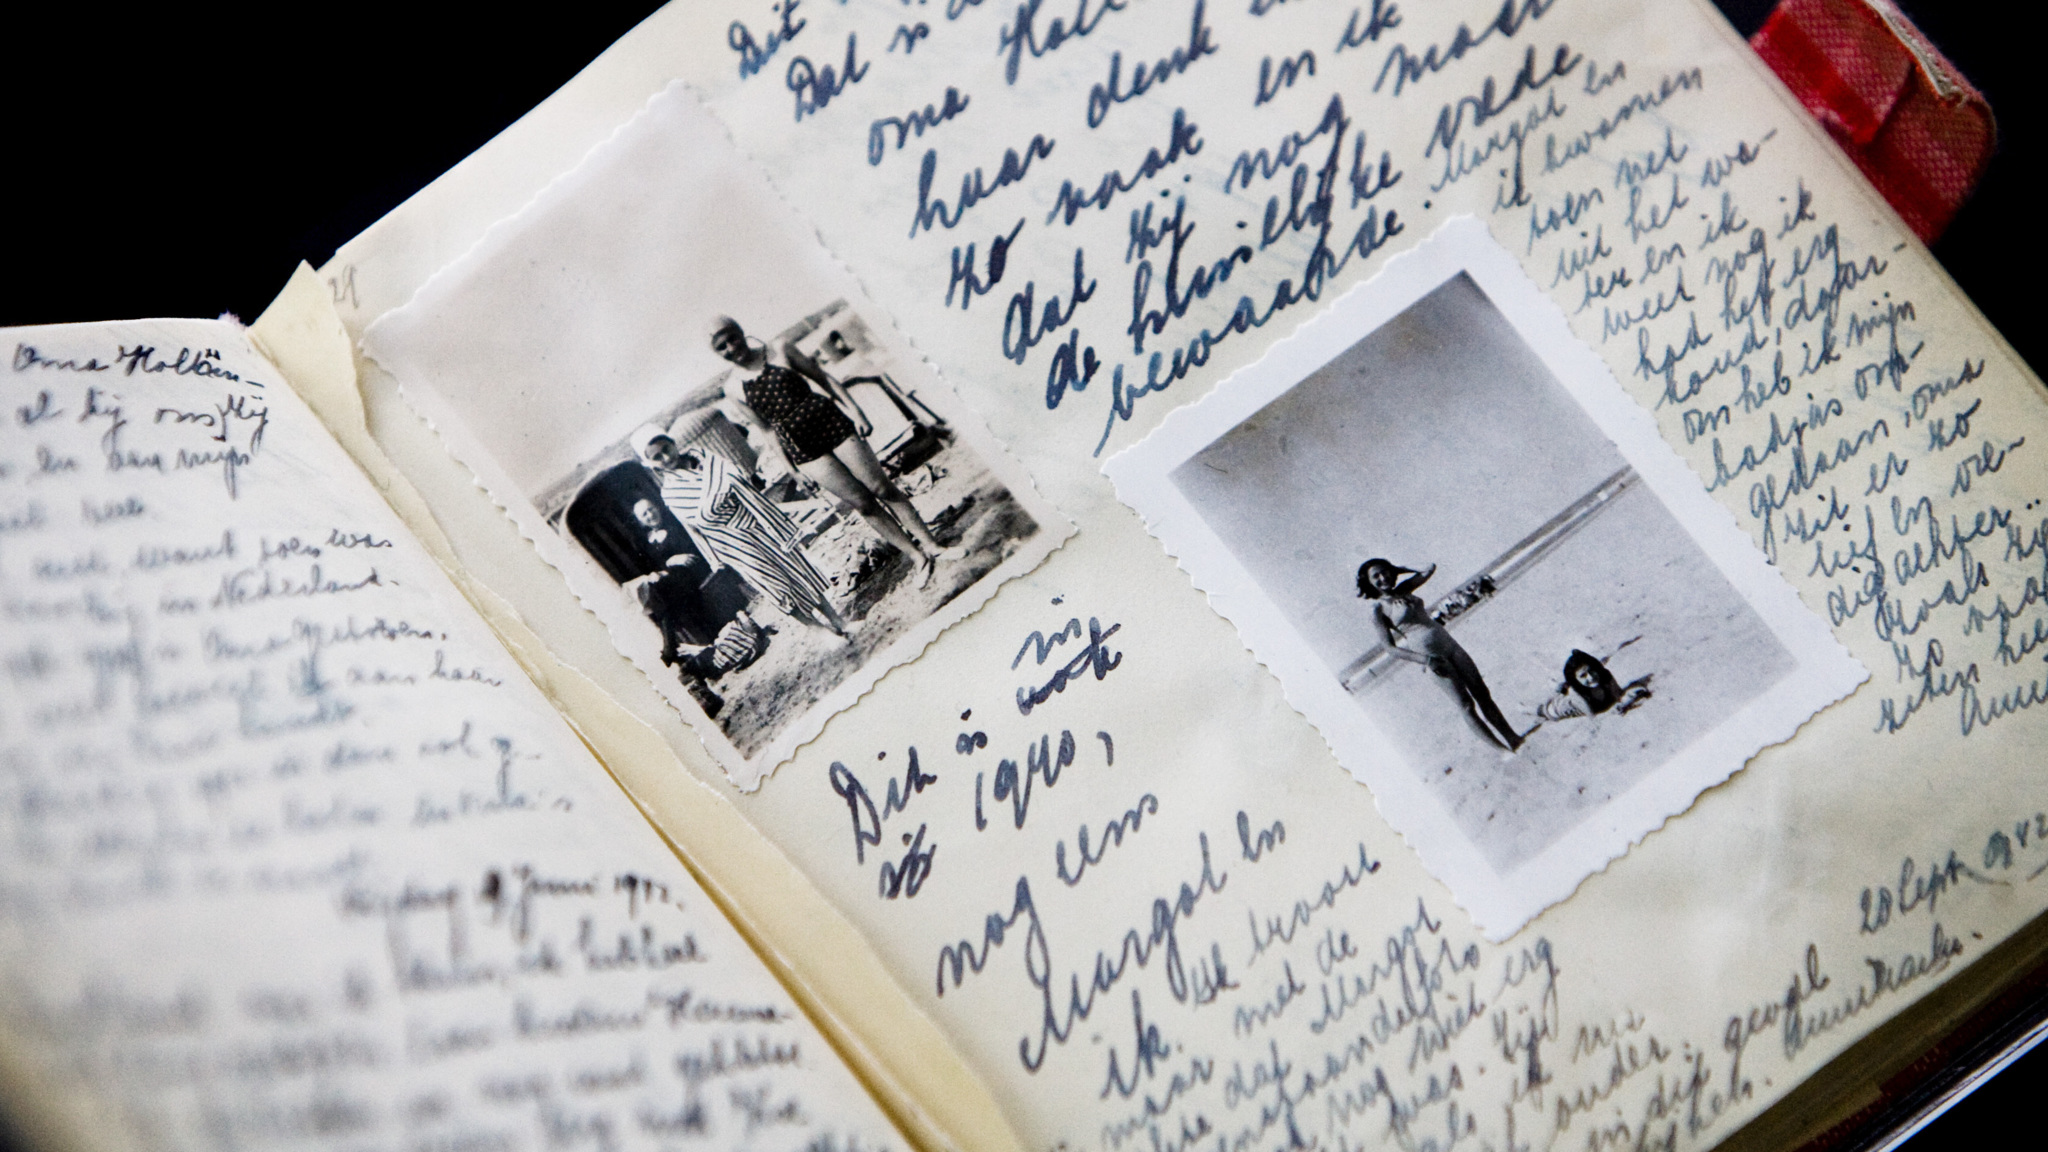 Citaten Uit Dagboek Anne Frank : Rechtszaak dreigt over auteursrecht dagboek anne frank nos